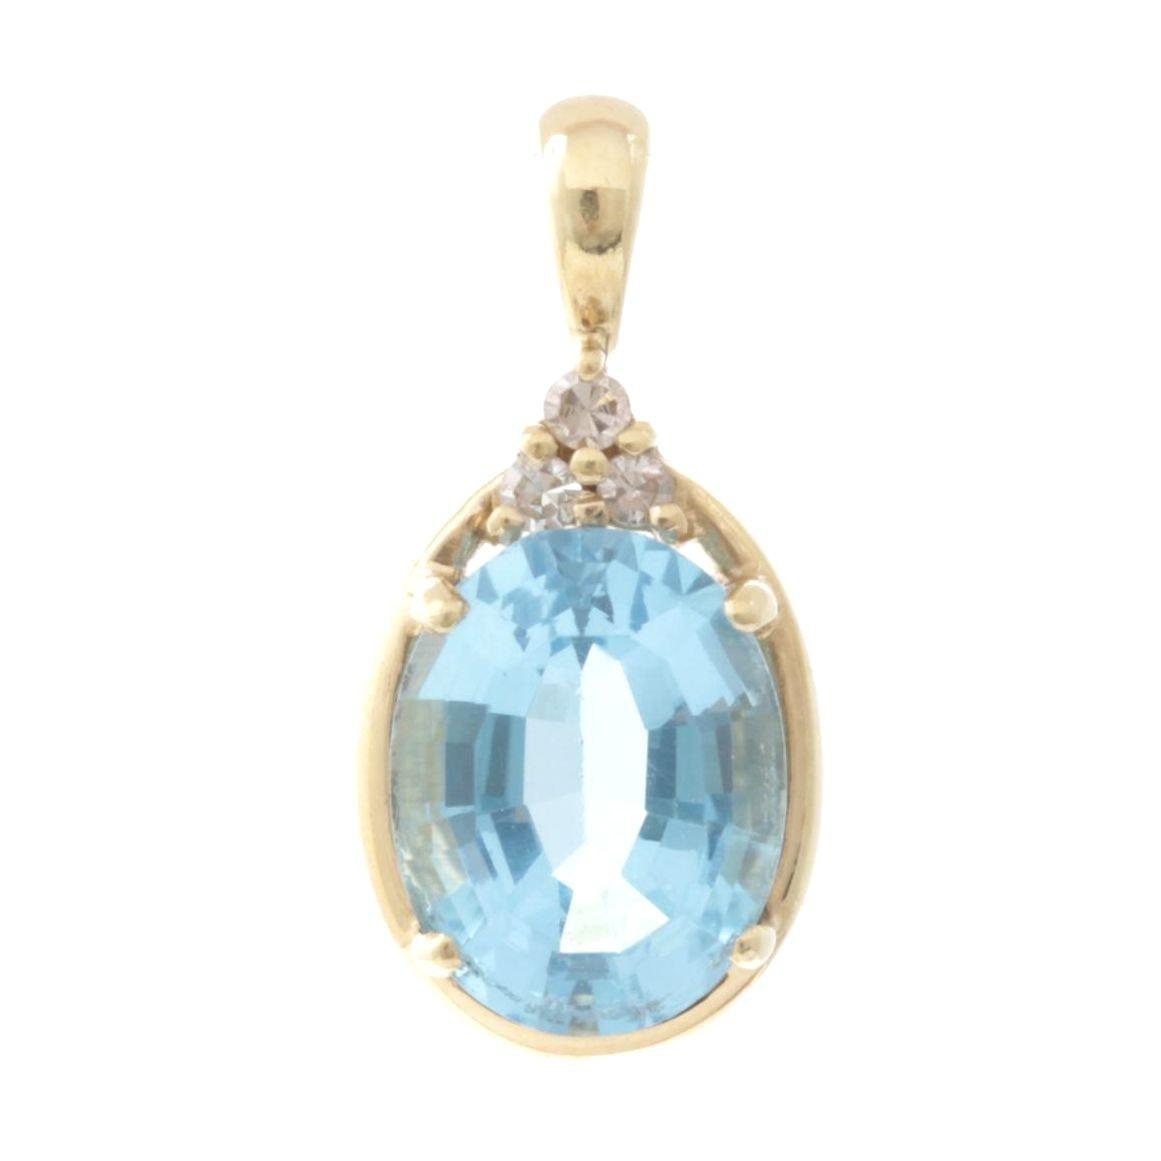 14K Yellow Gold Blue Topaz and Diamond Pendant